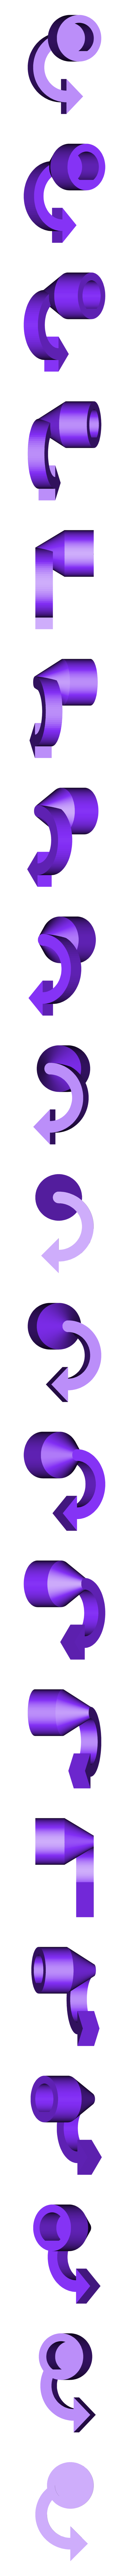 Anycubic_I3_Mega_Filamentrollenhalter-ExtruderDrehIndikator.stl Download free STL file Anycubic I3 Mega Spool Holder • 3D print object, dede67